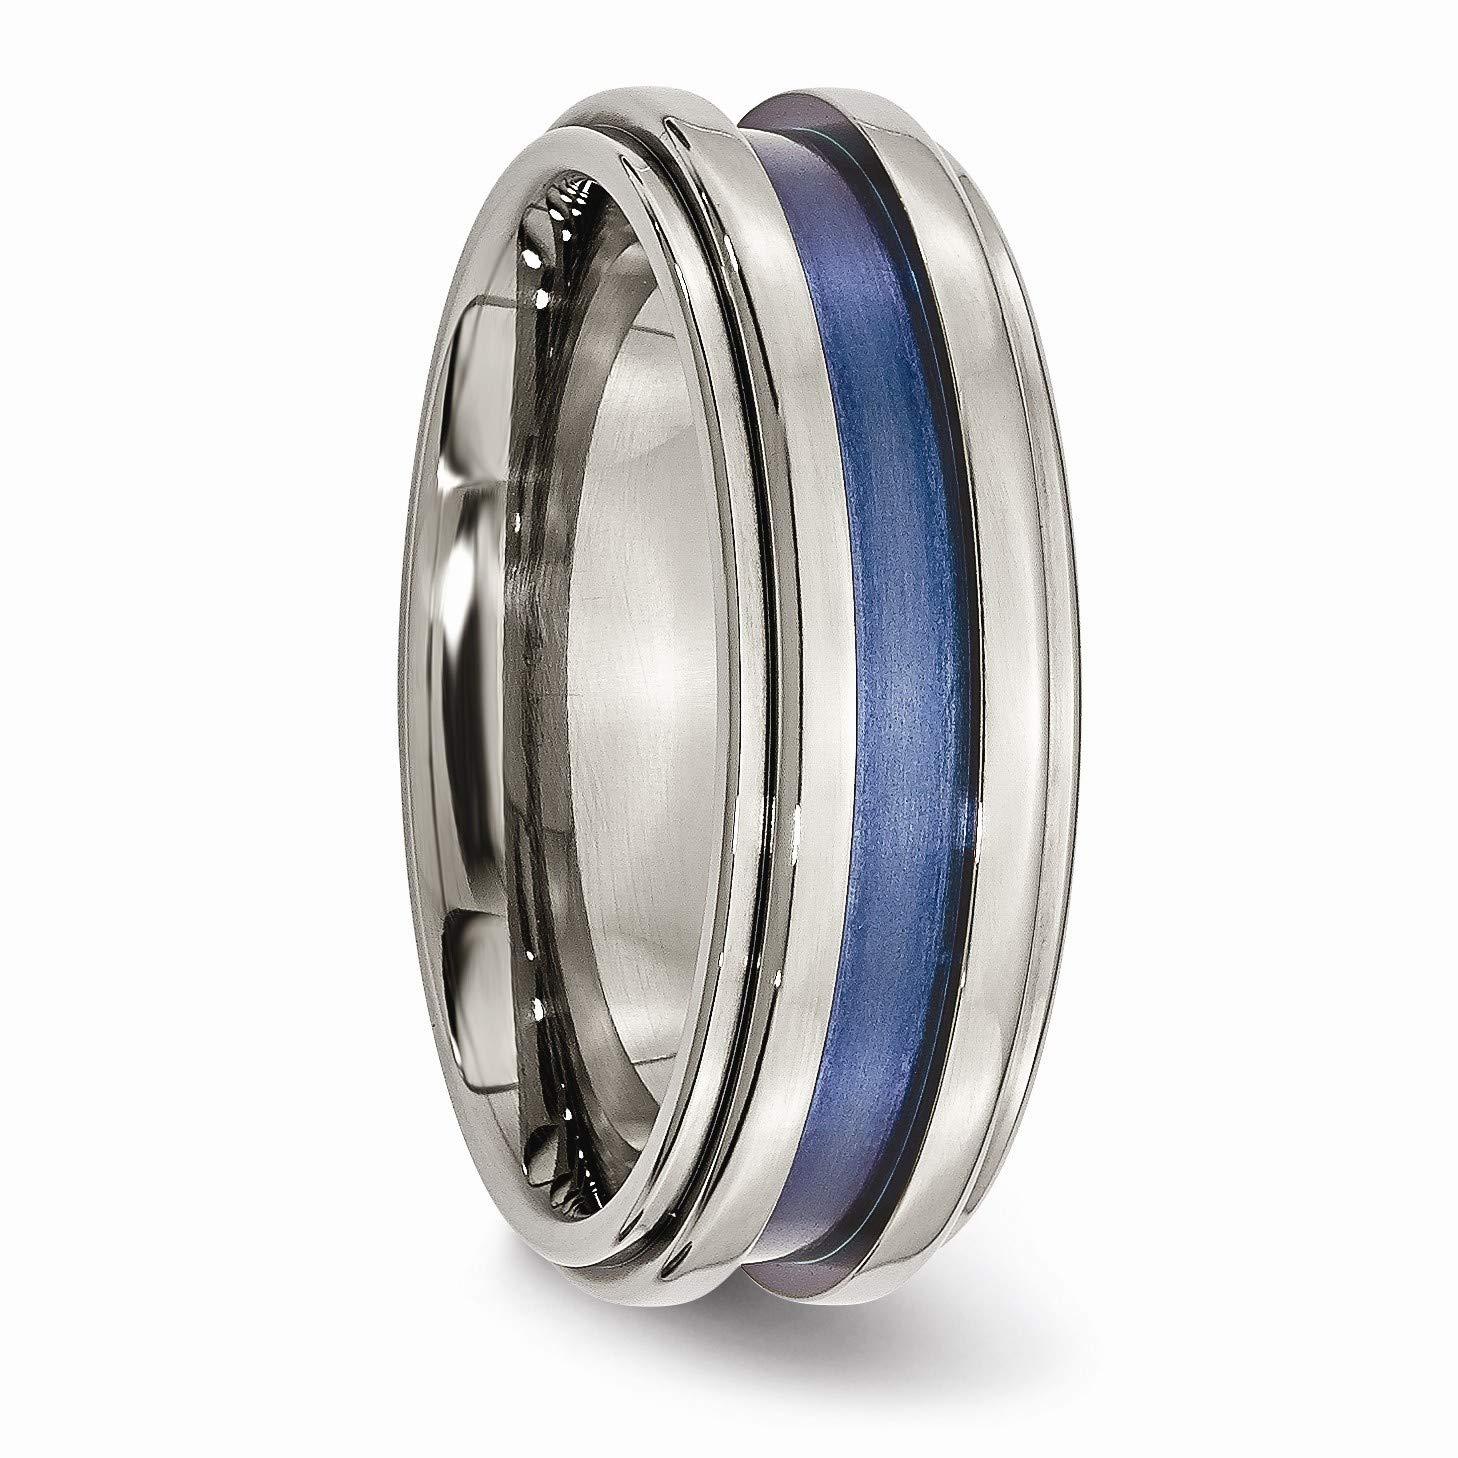 Black Bow Jewelry 8mm Titanium Blue Groove Ridged Edge Polished Band